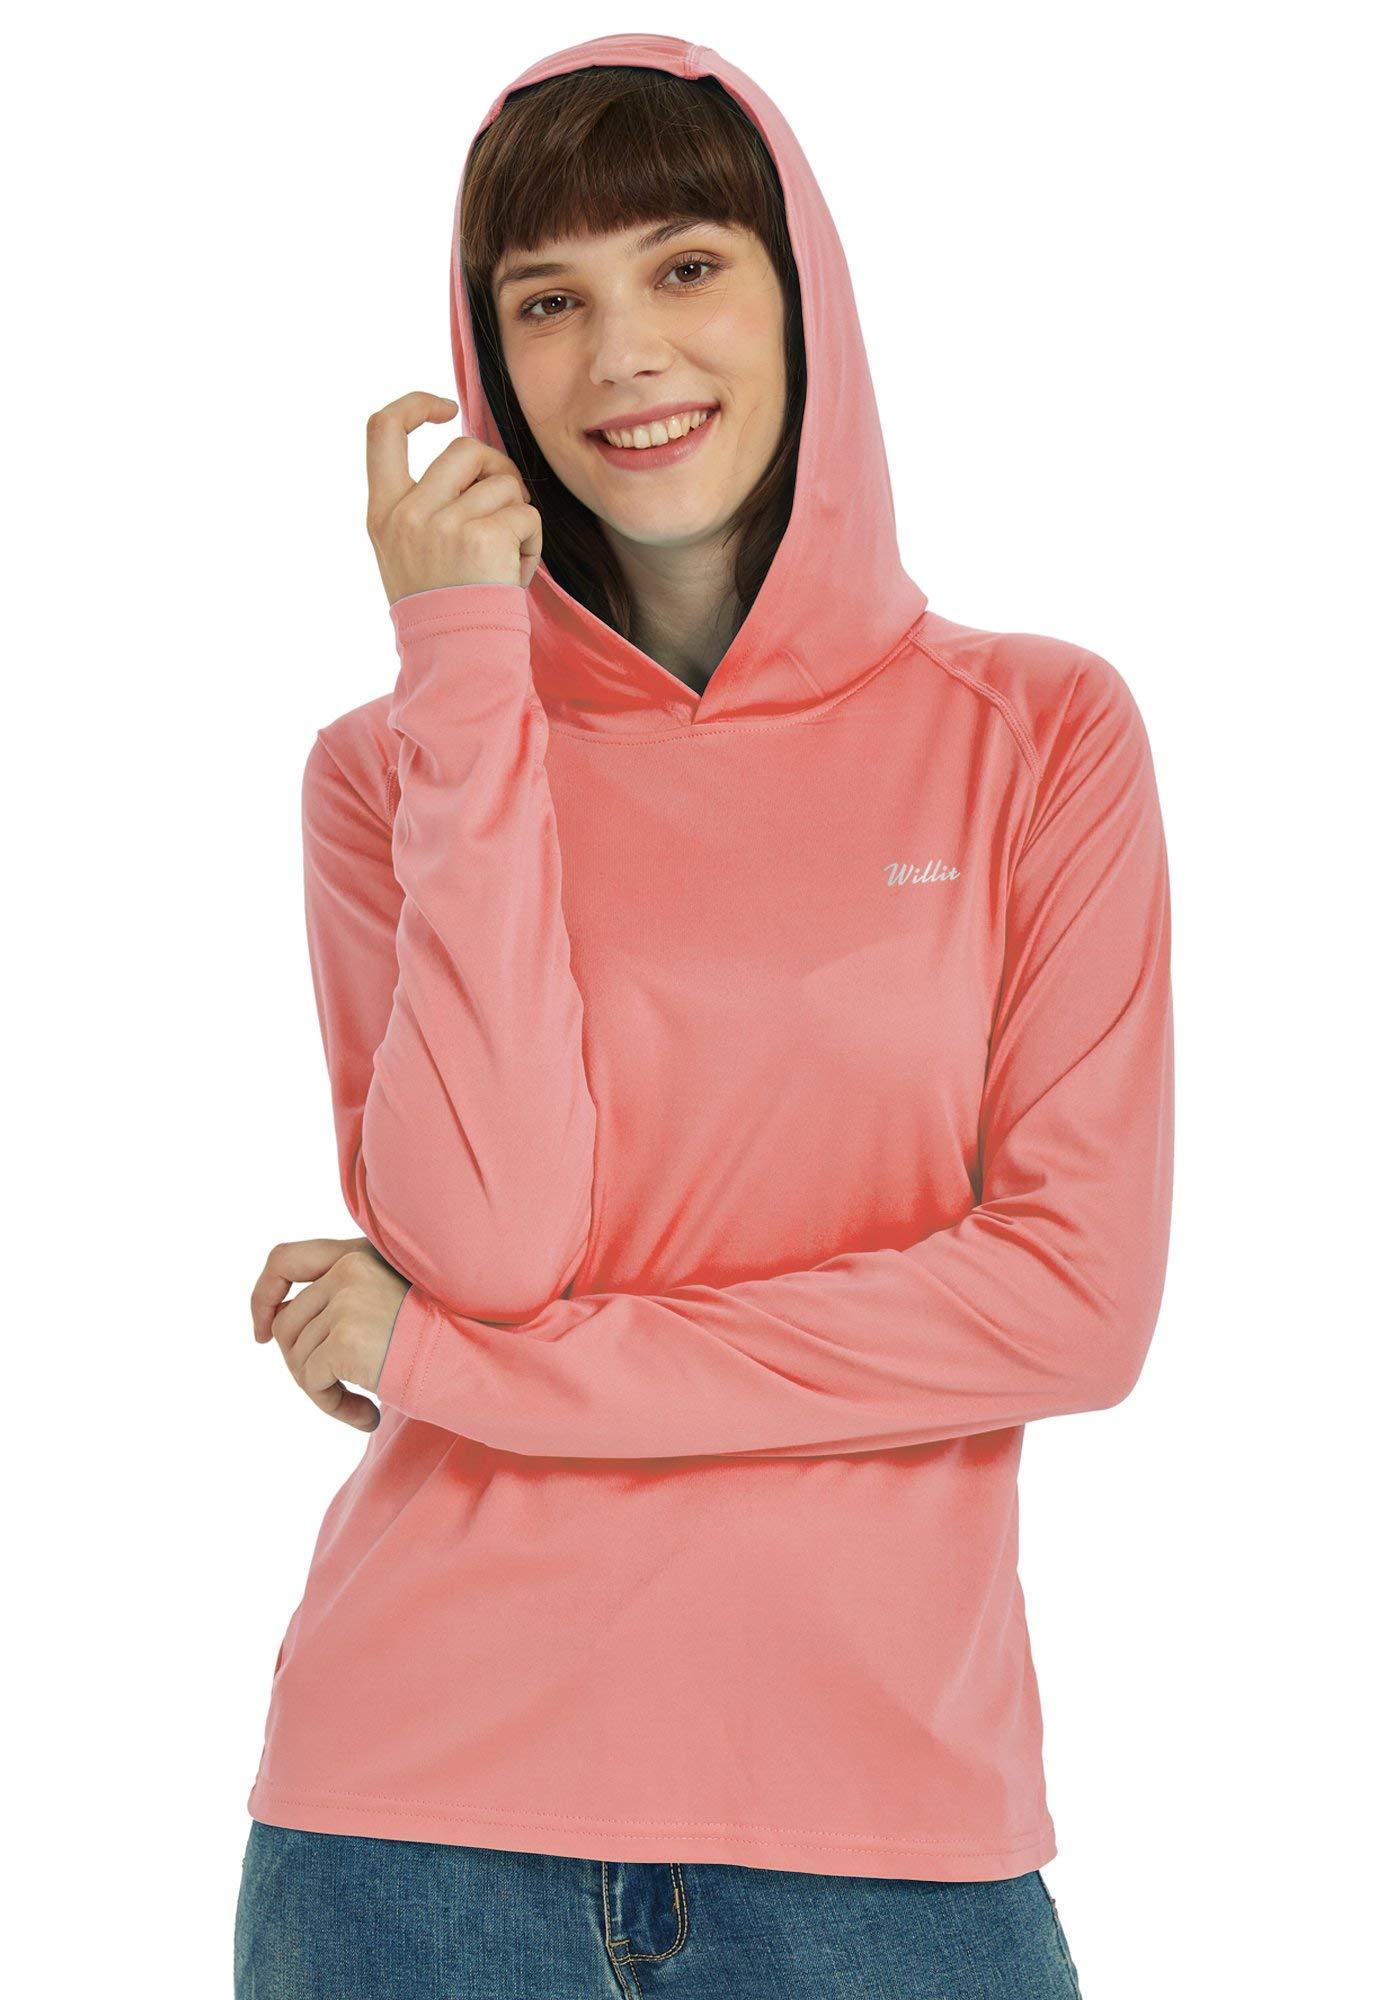 Willit Women's UPF 50+ Sun Protection Hoodie